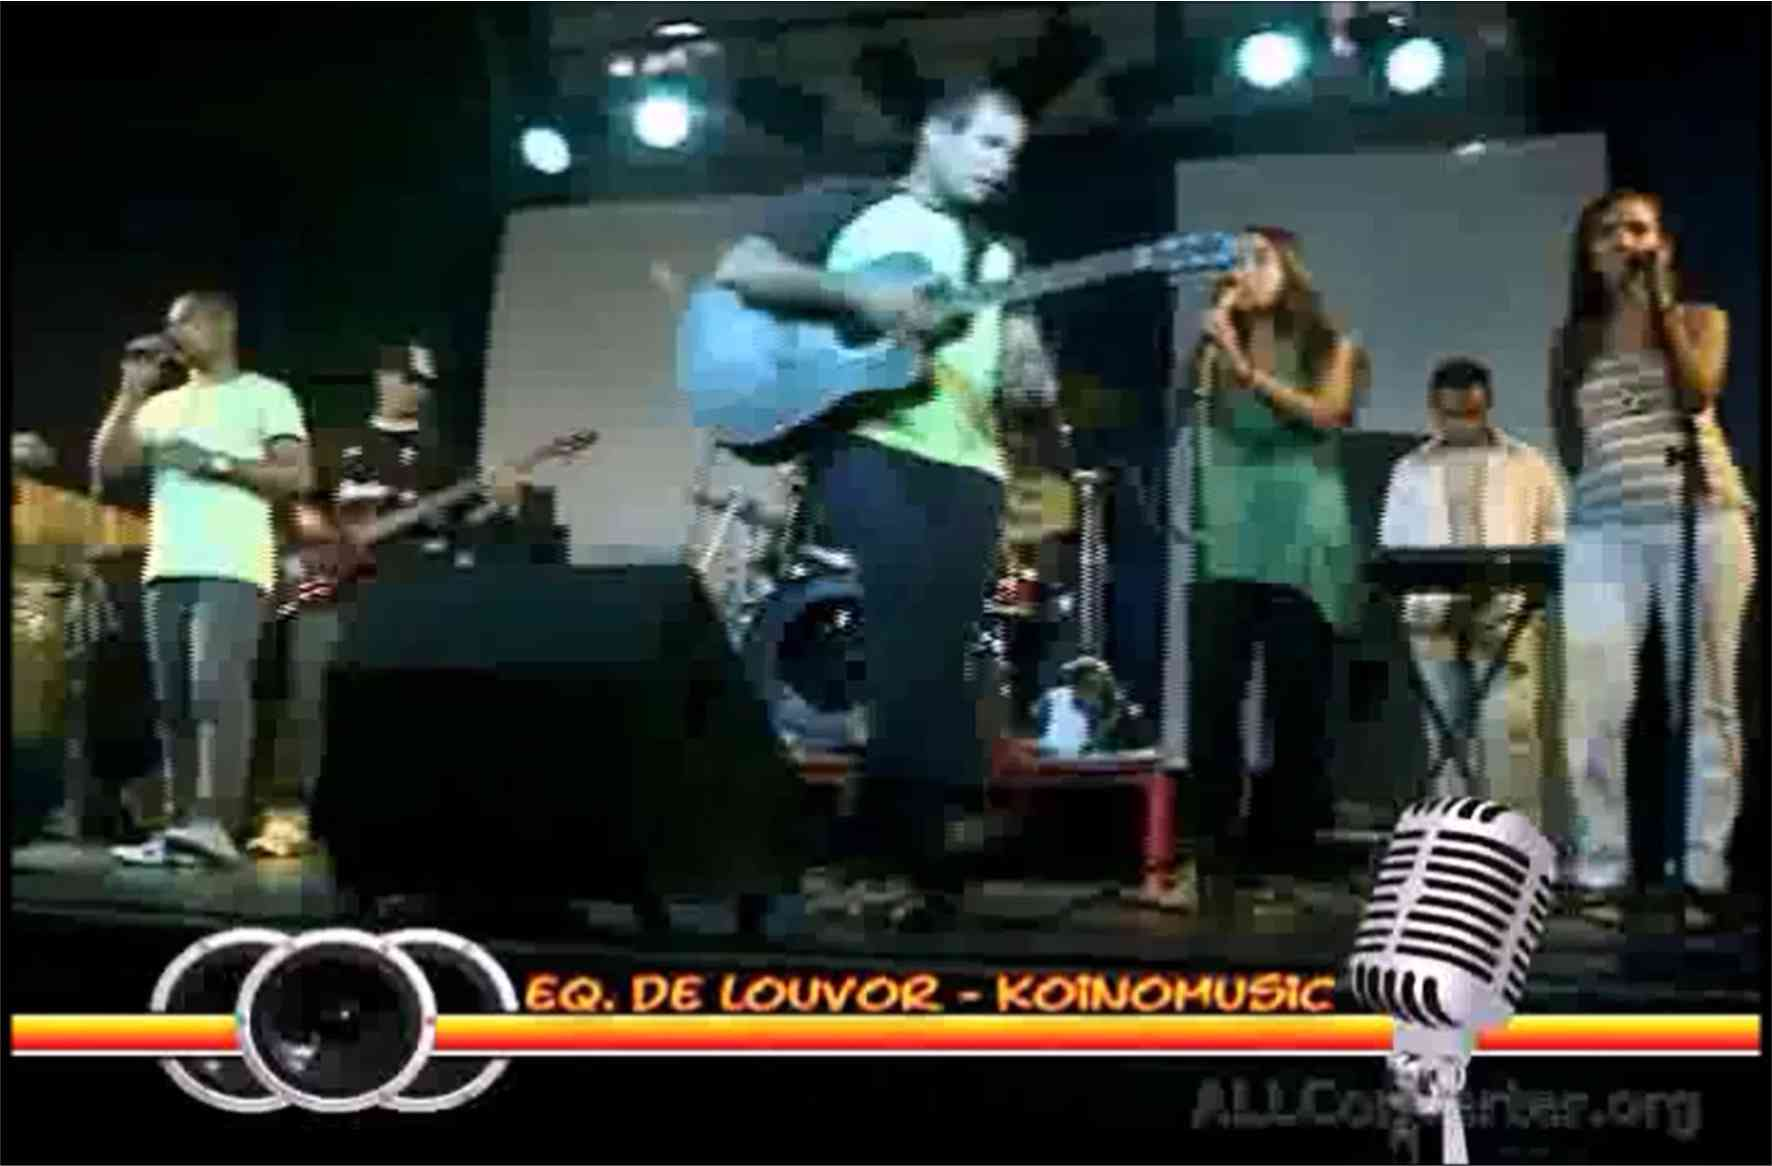 Projeto_Koinomusic_Filme_04_03